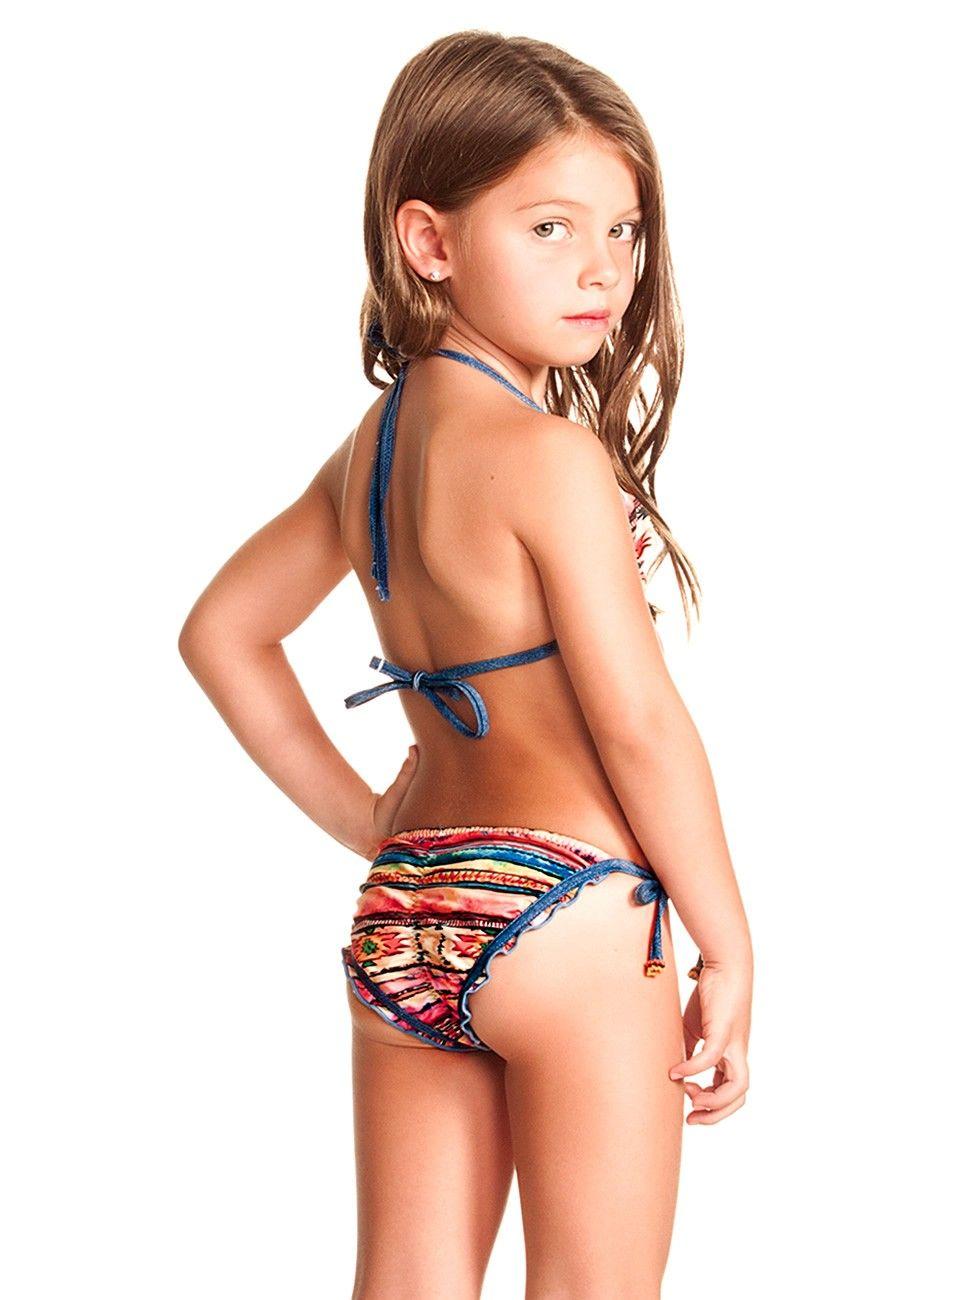 Young Little Bikini